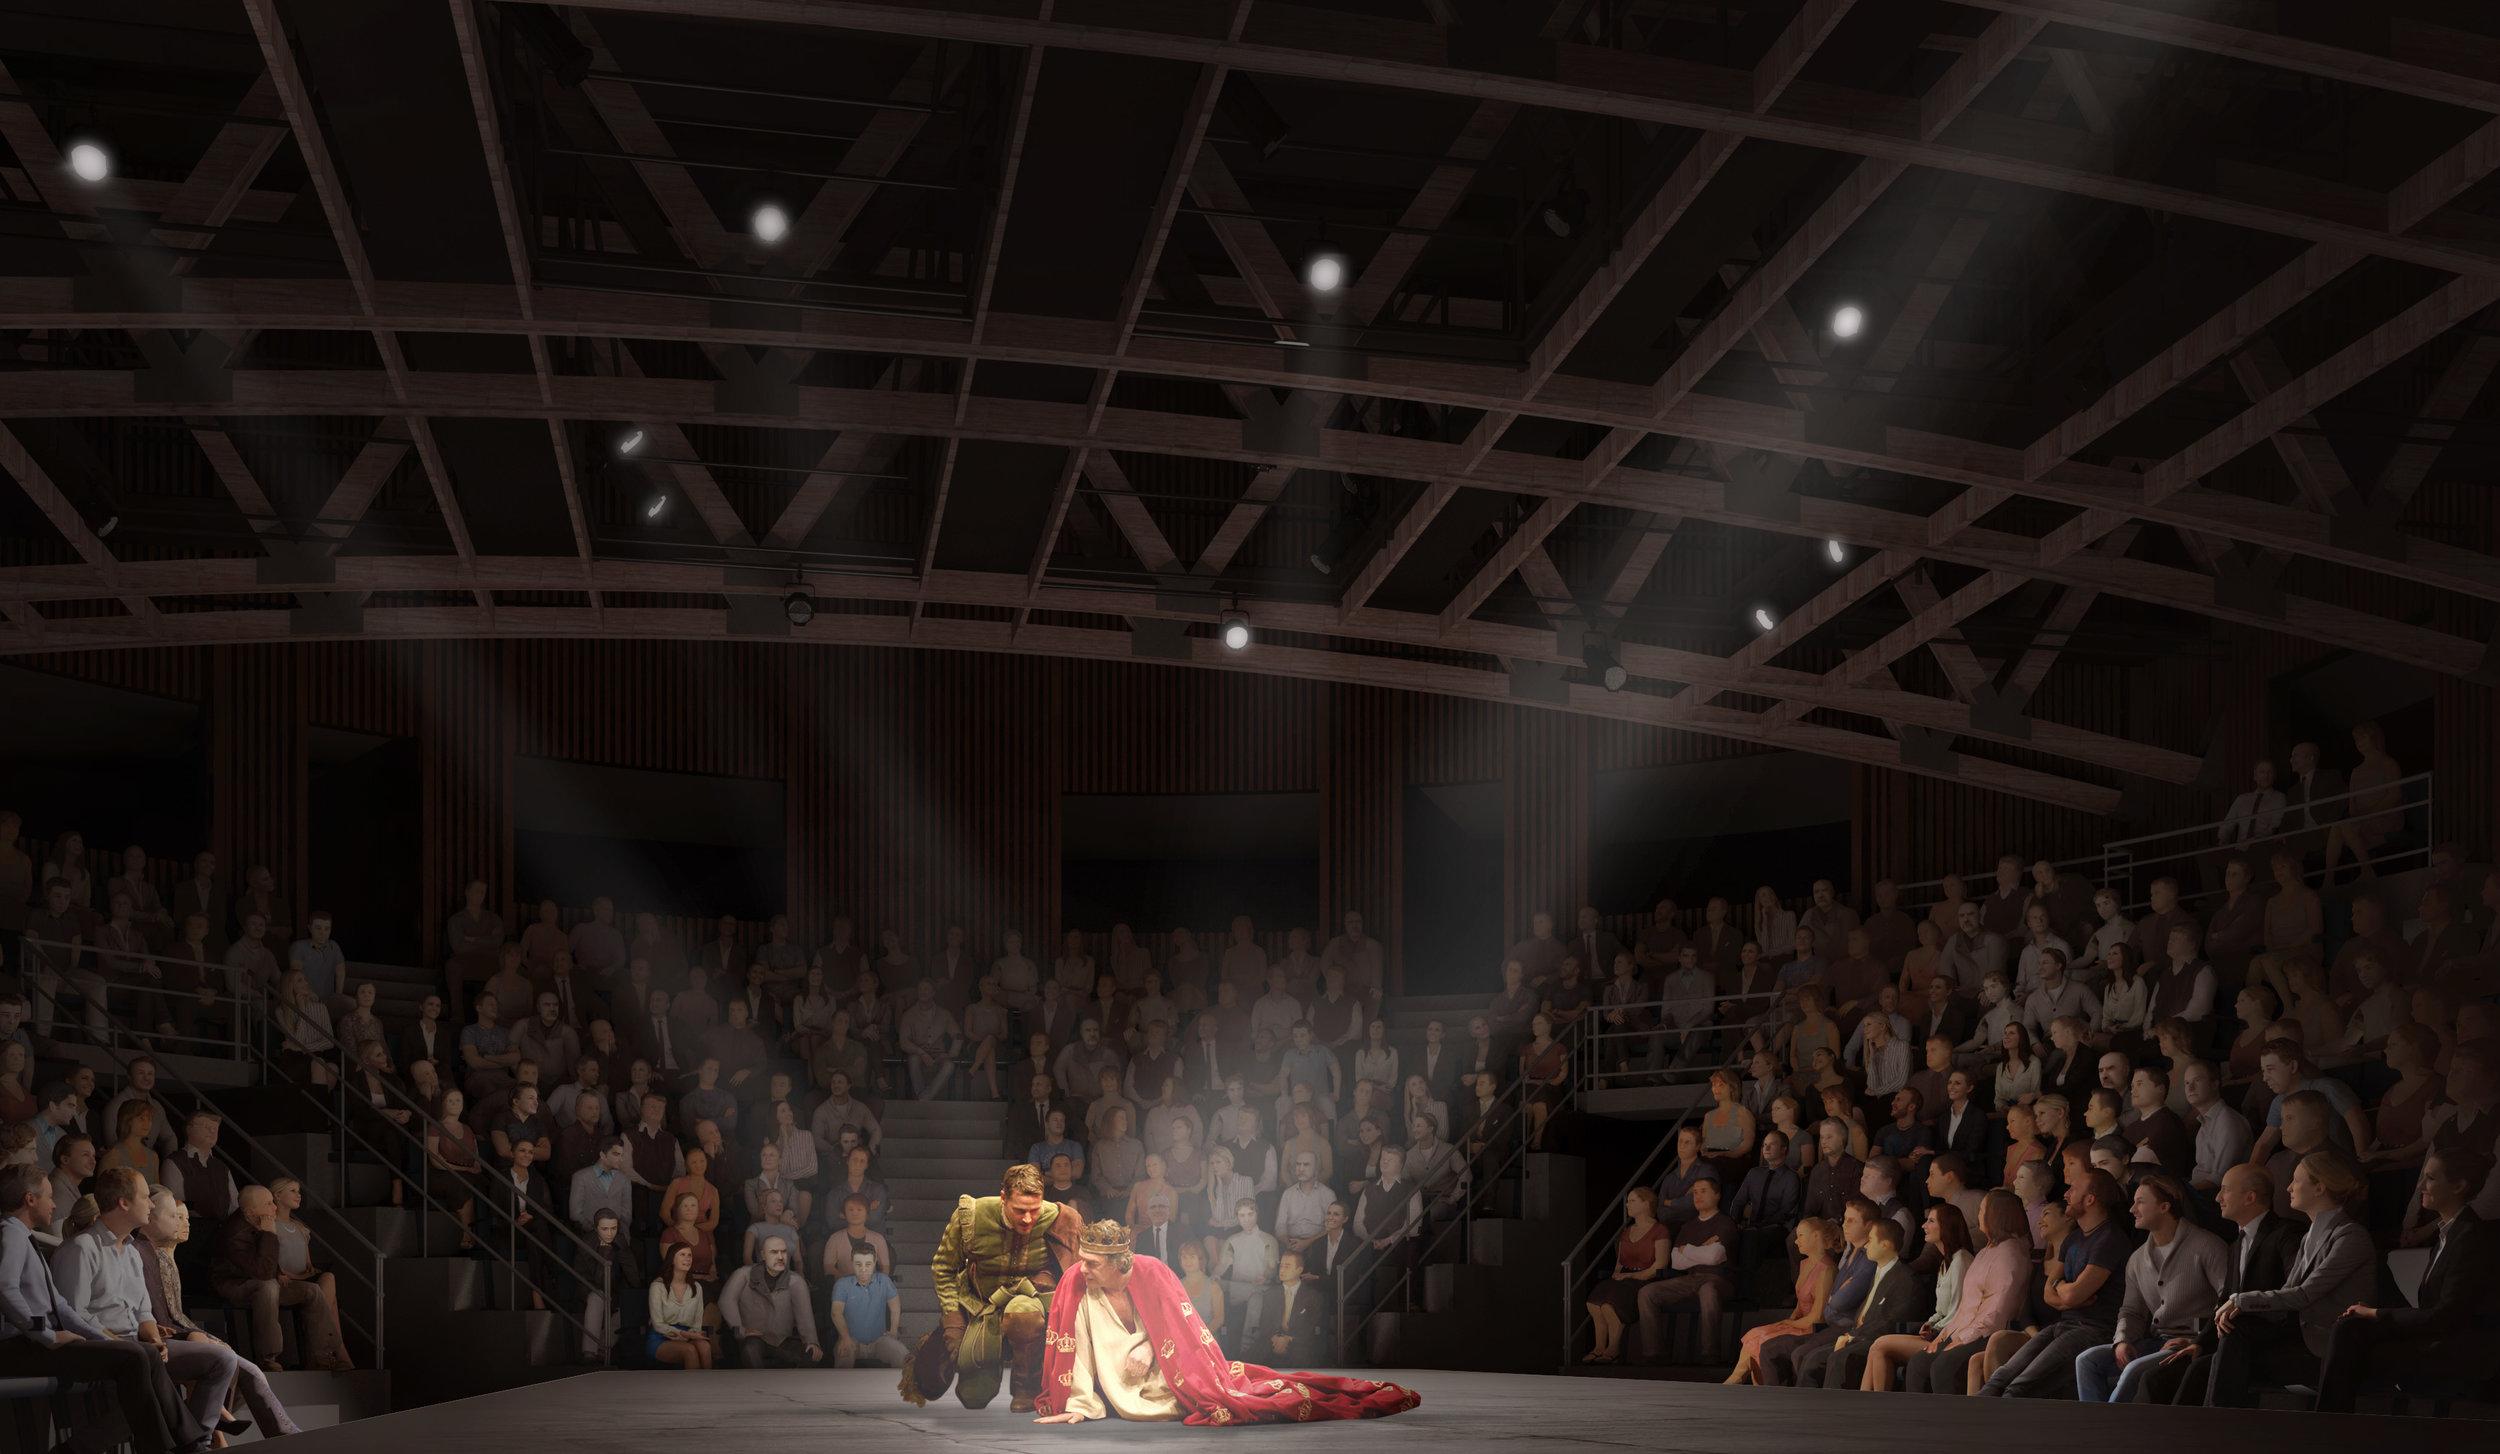 KPMB_StratfordTheater_StageView_FINAL_light.jpg